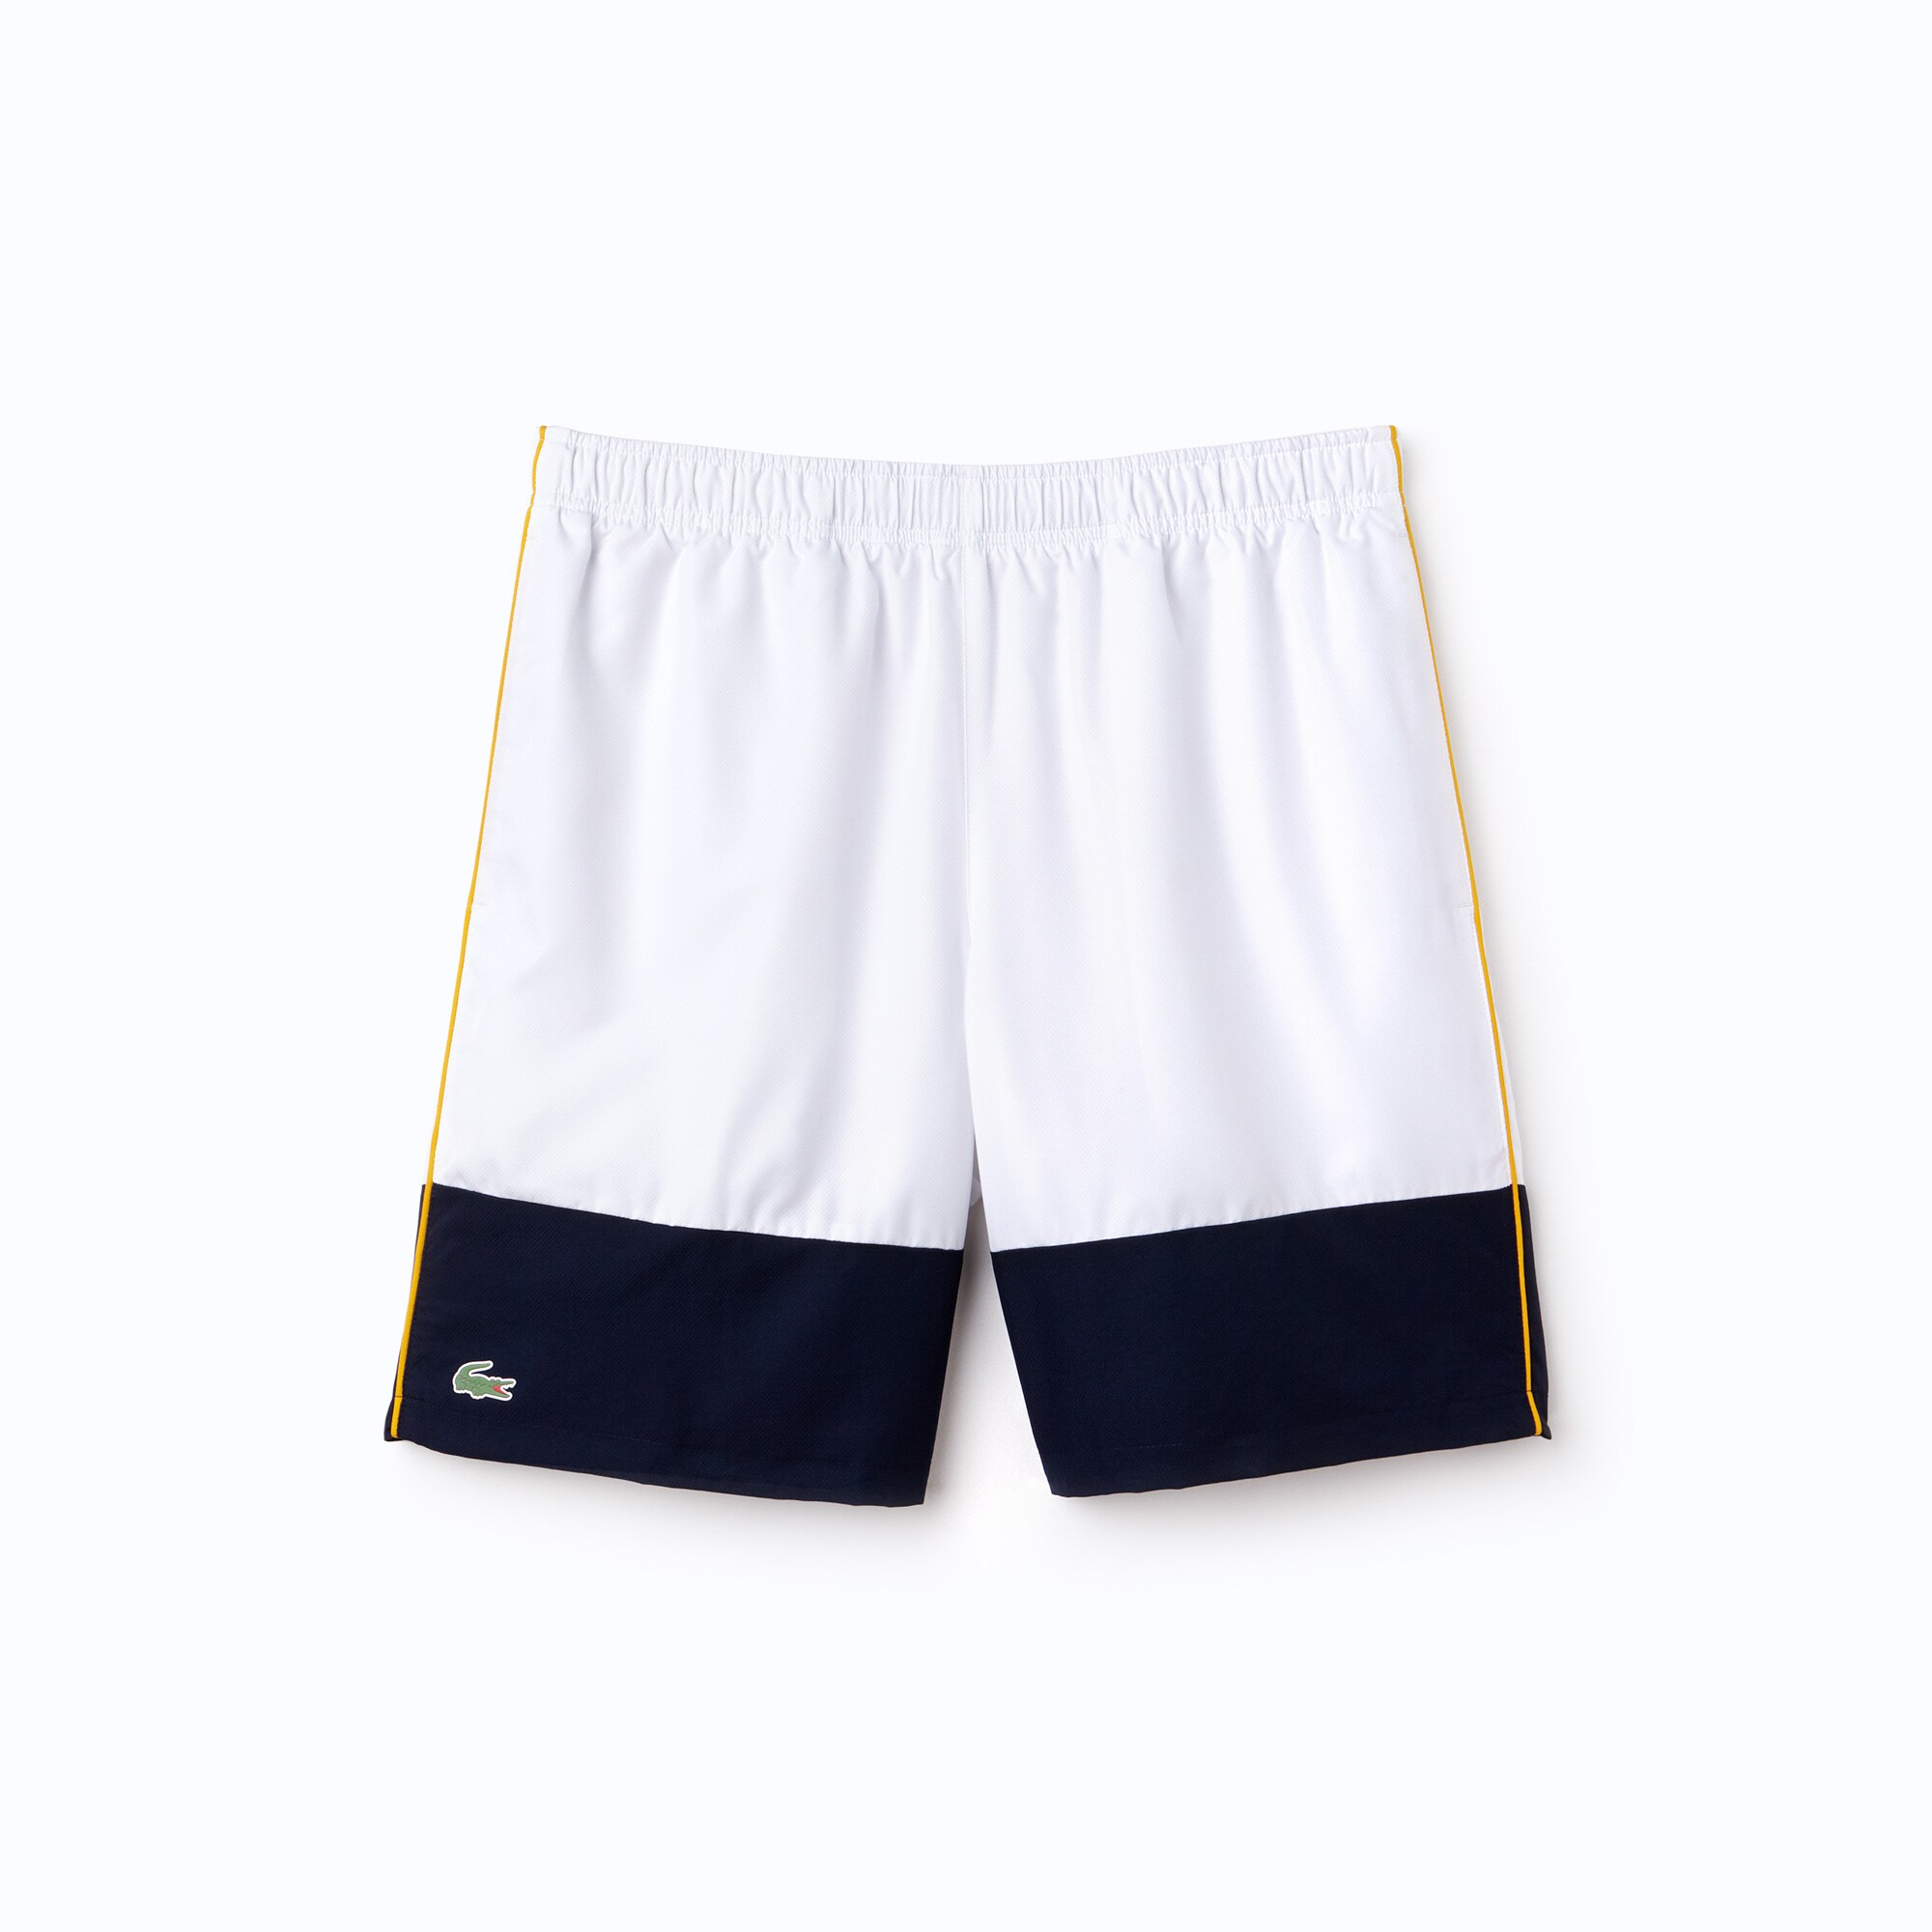 Herren LACOSTE SPORT Taft Shorts mir Colorblocks